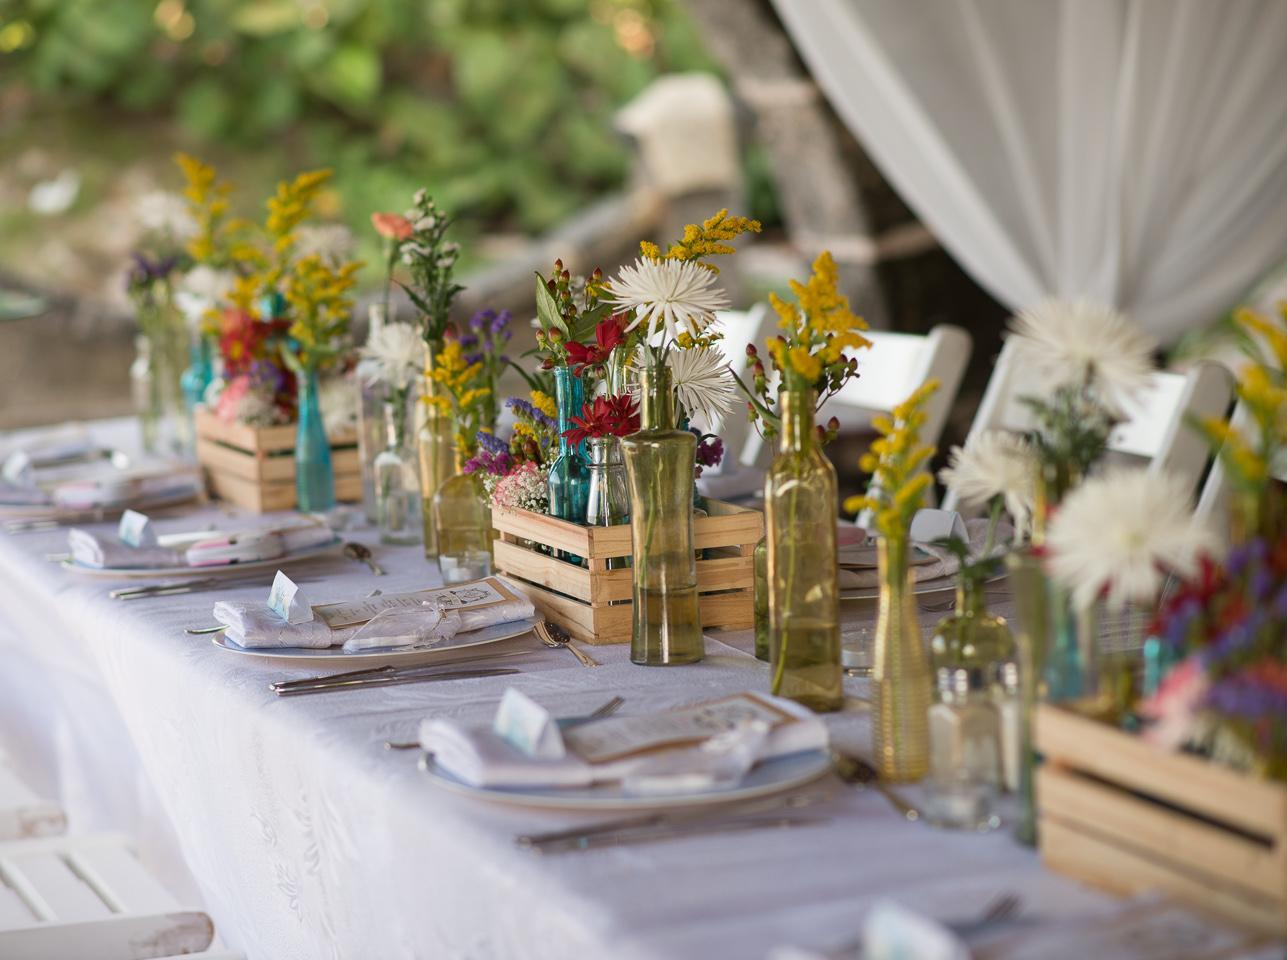 bodas-rustico-playa-cuba-2272.jpg